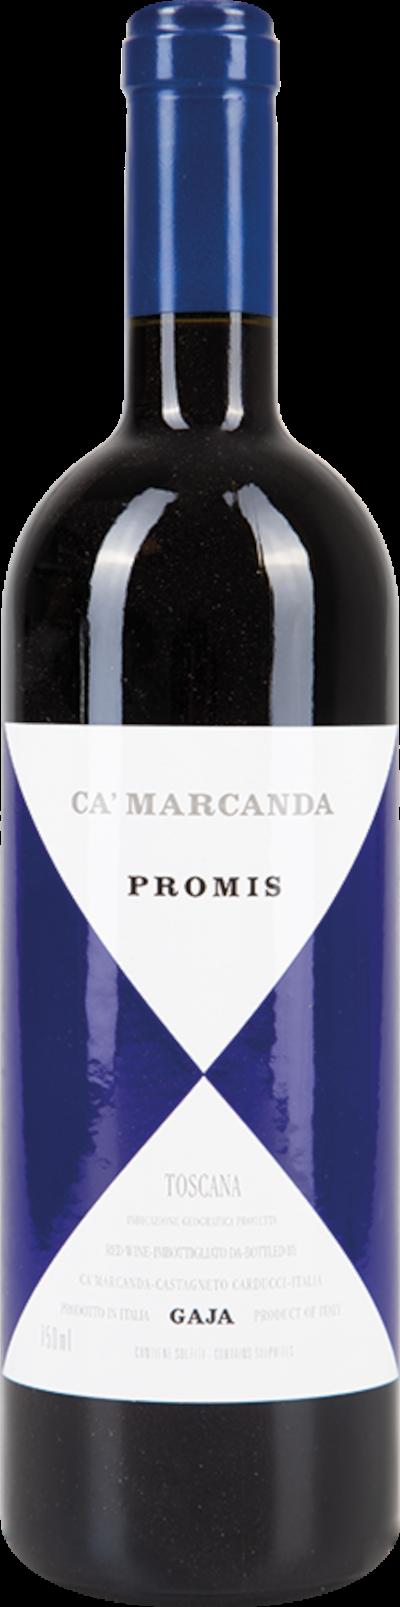 Ca' Marcanda - Promis Toscana IGP